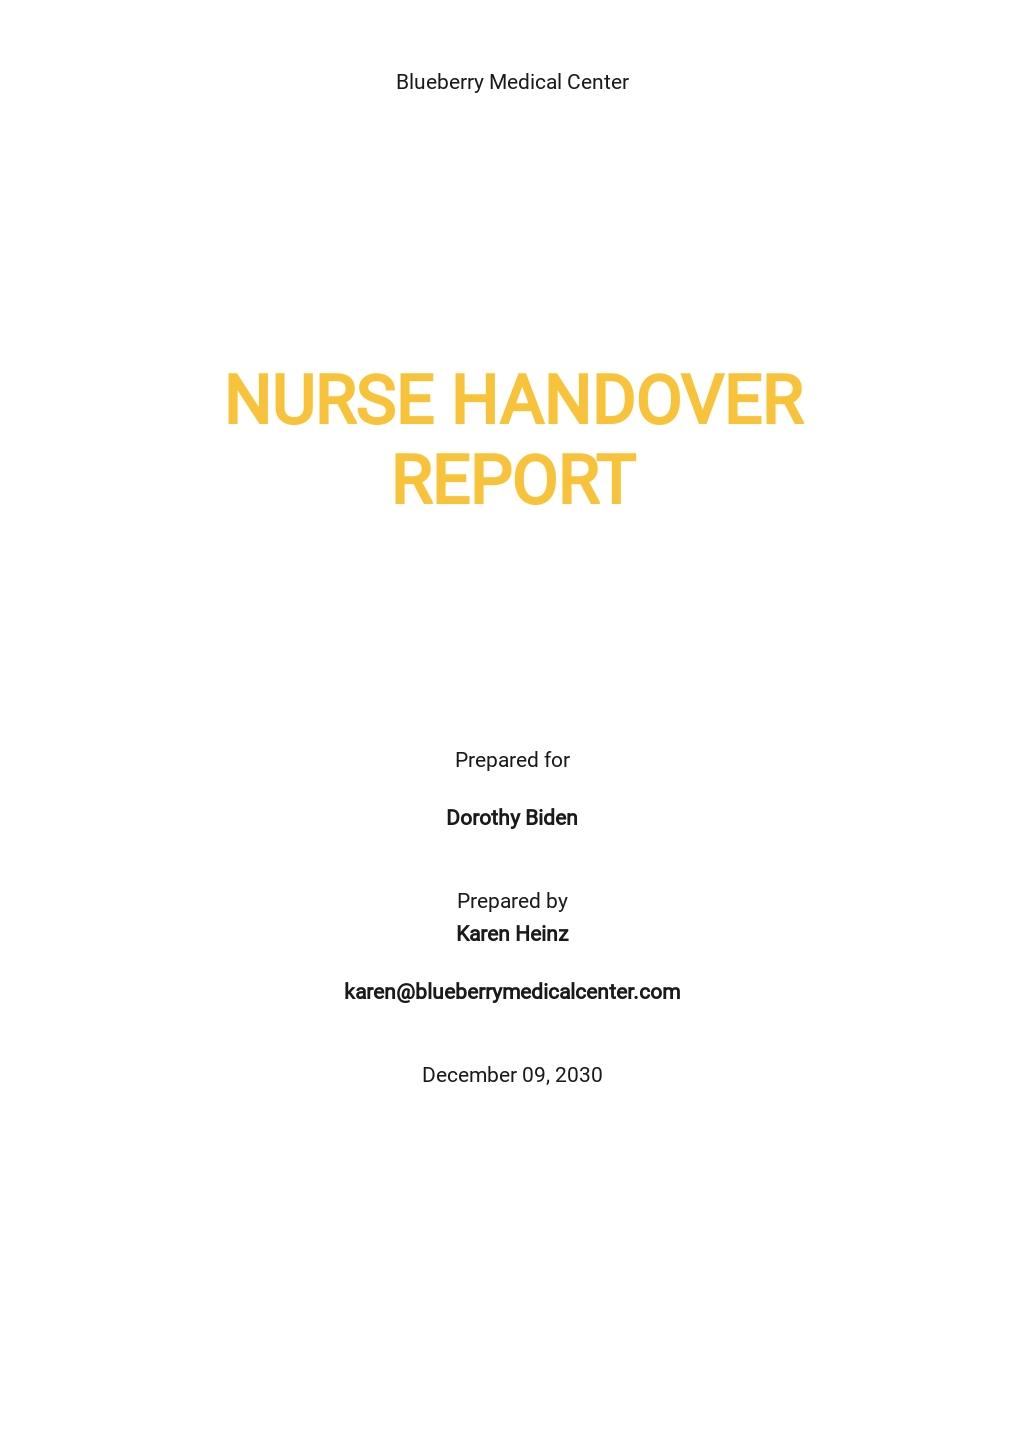 Free Nurse Handover Report Template.jpe